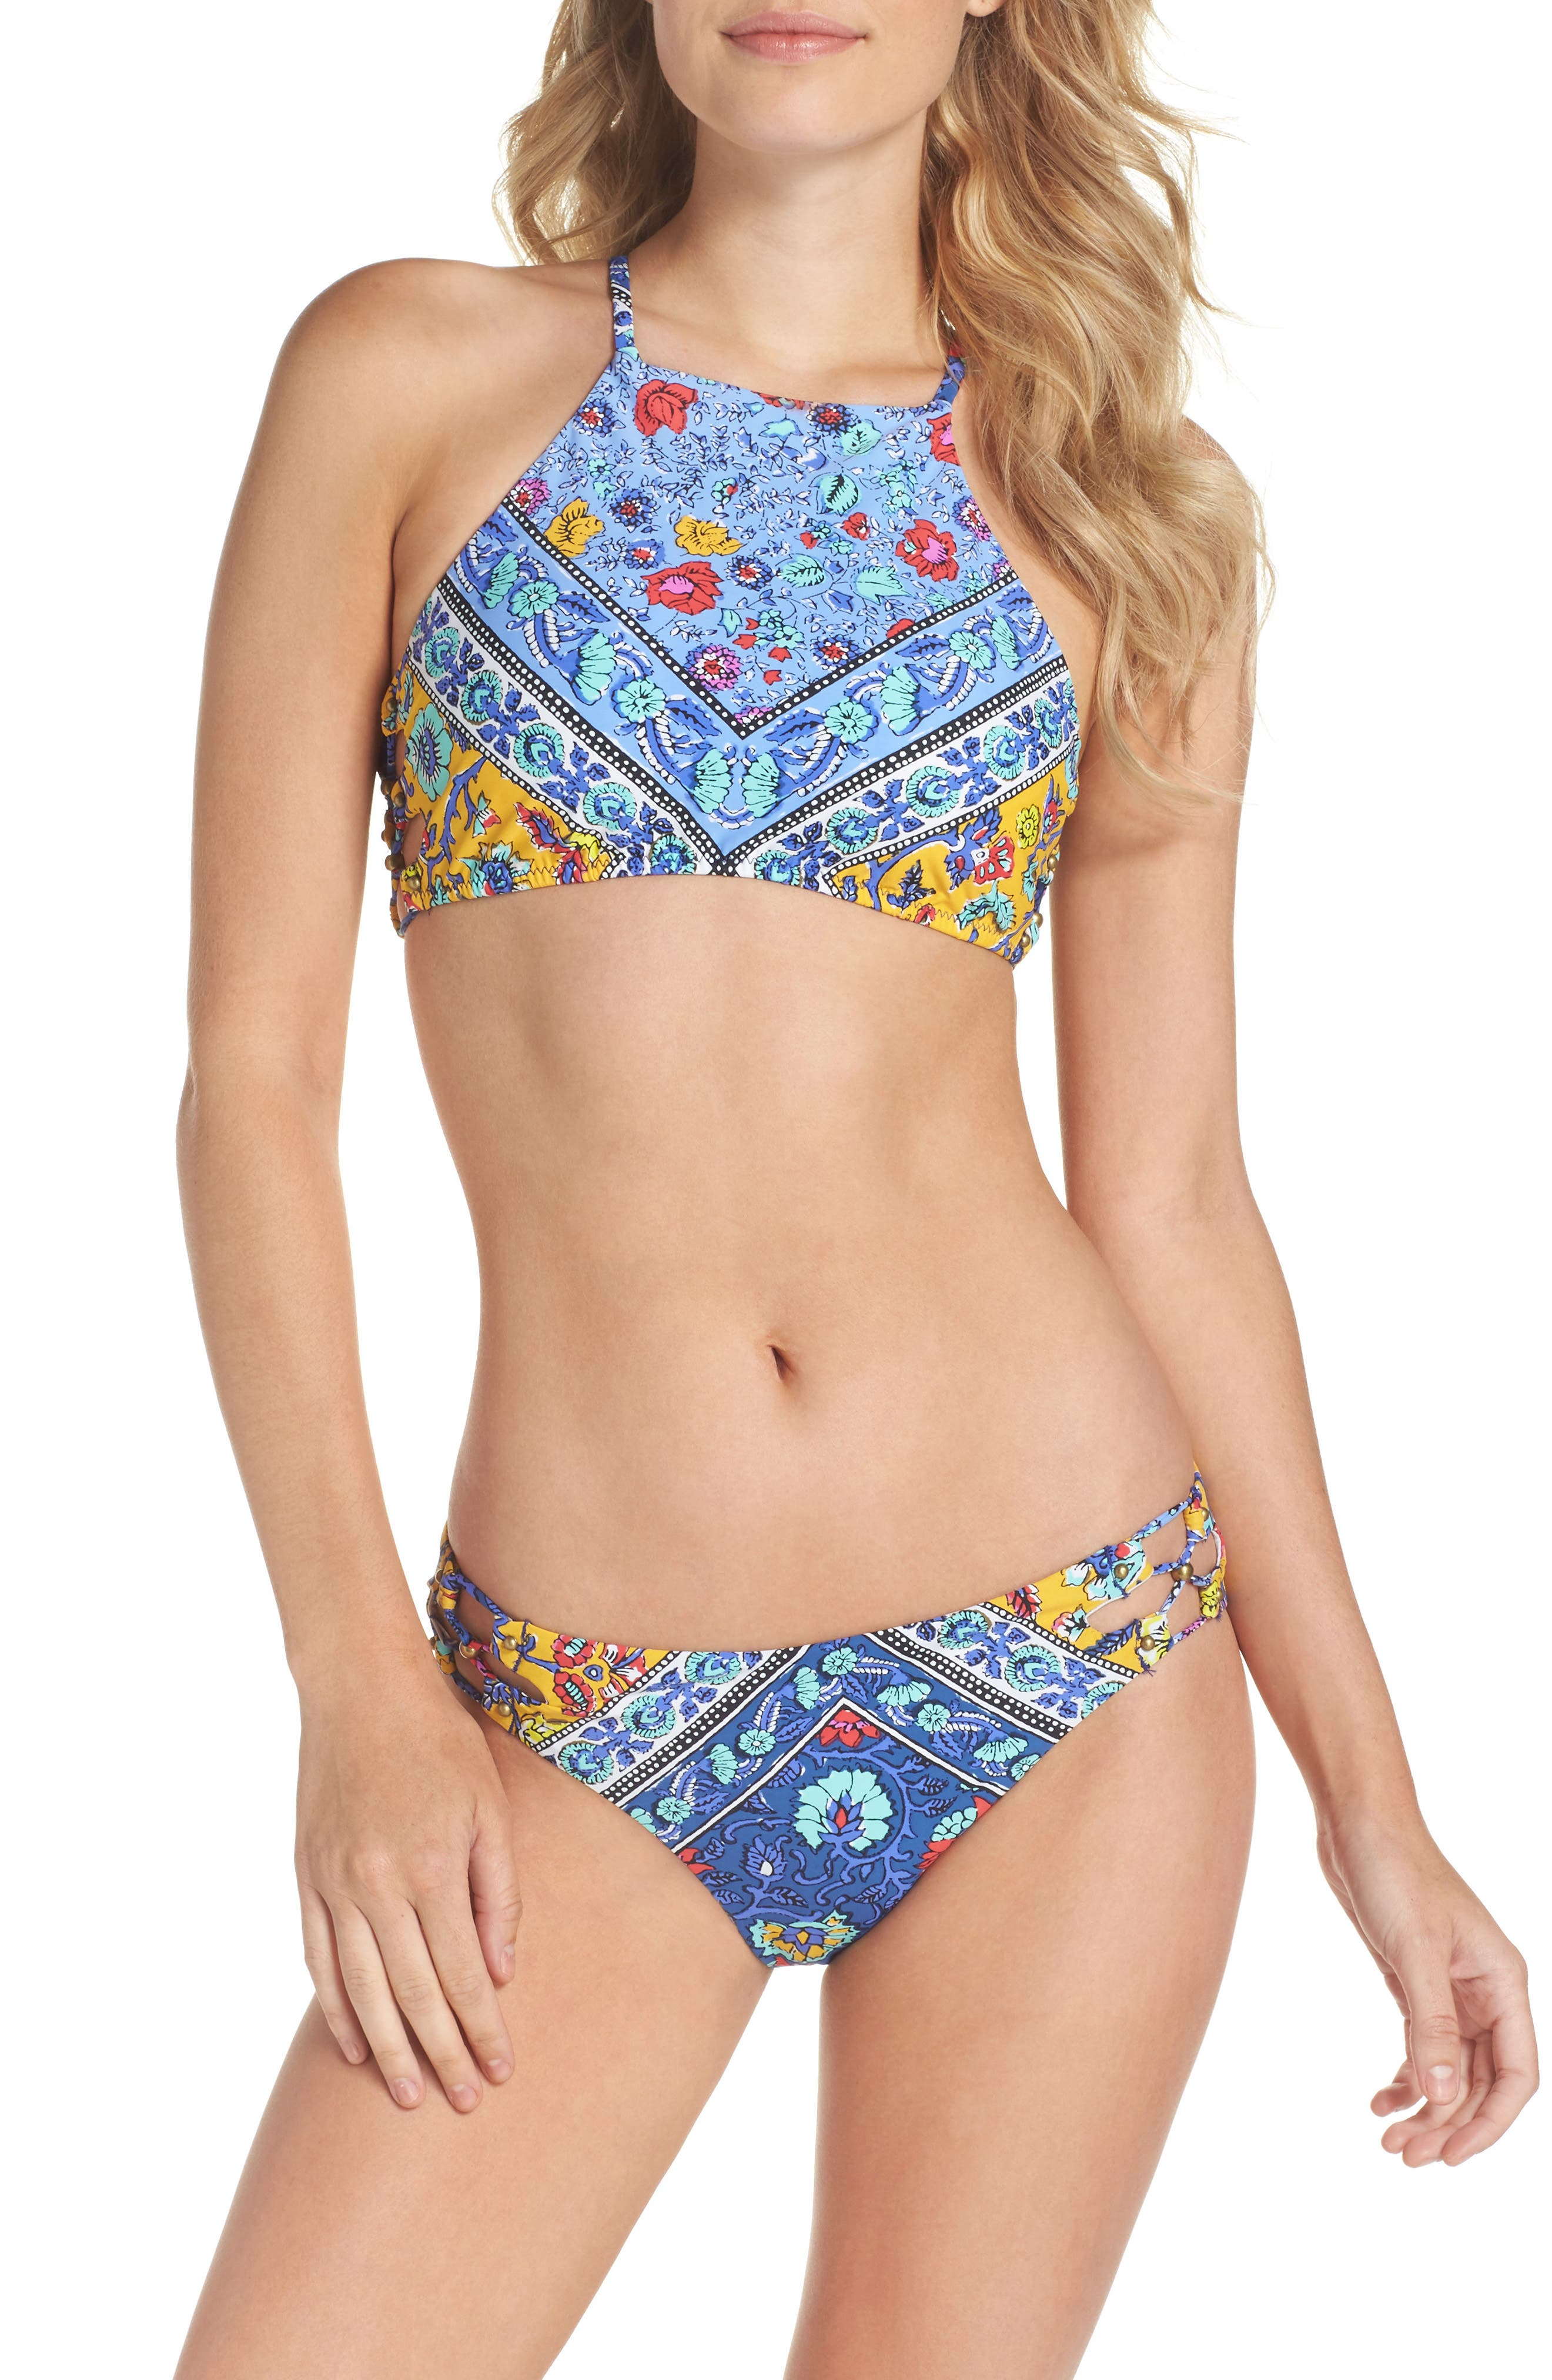 Nanette Lepore Bikini Top & Bottoms